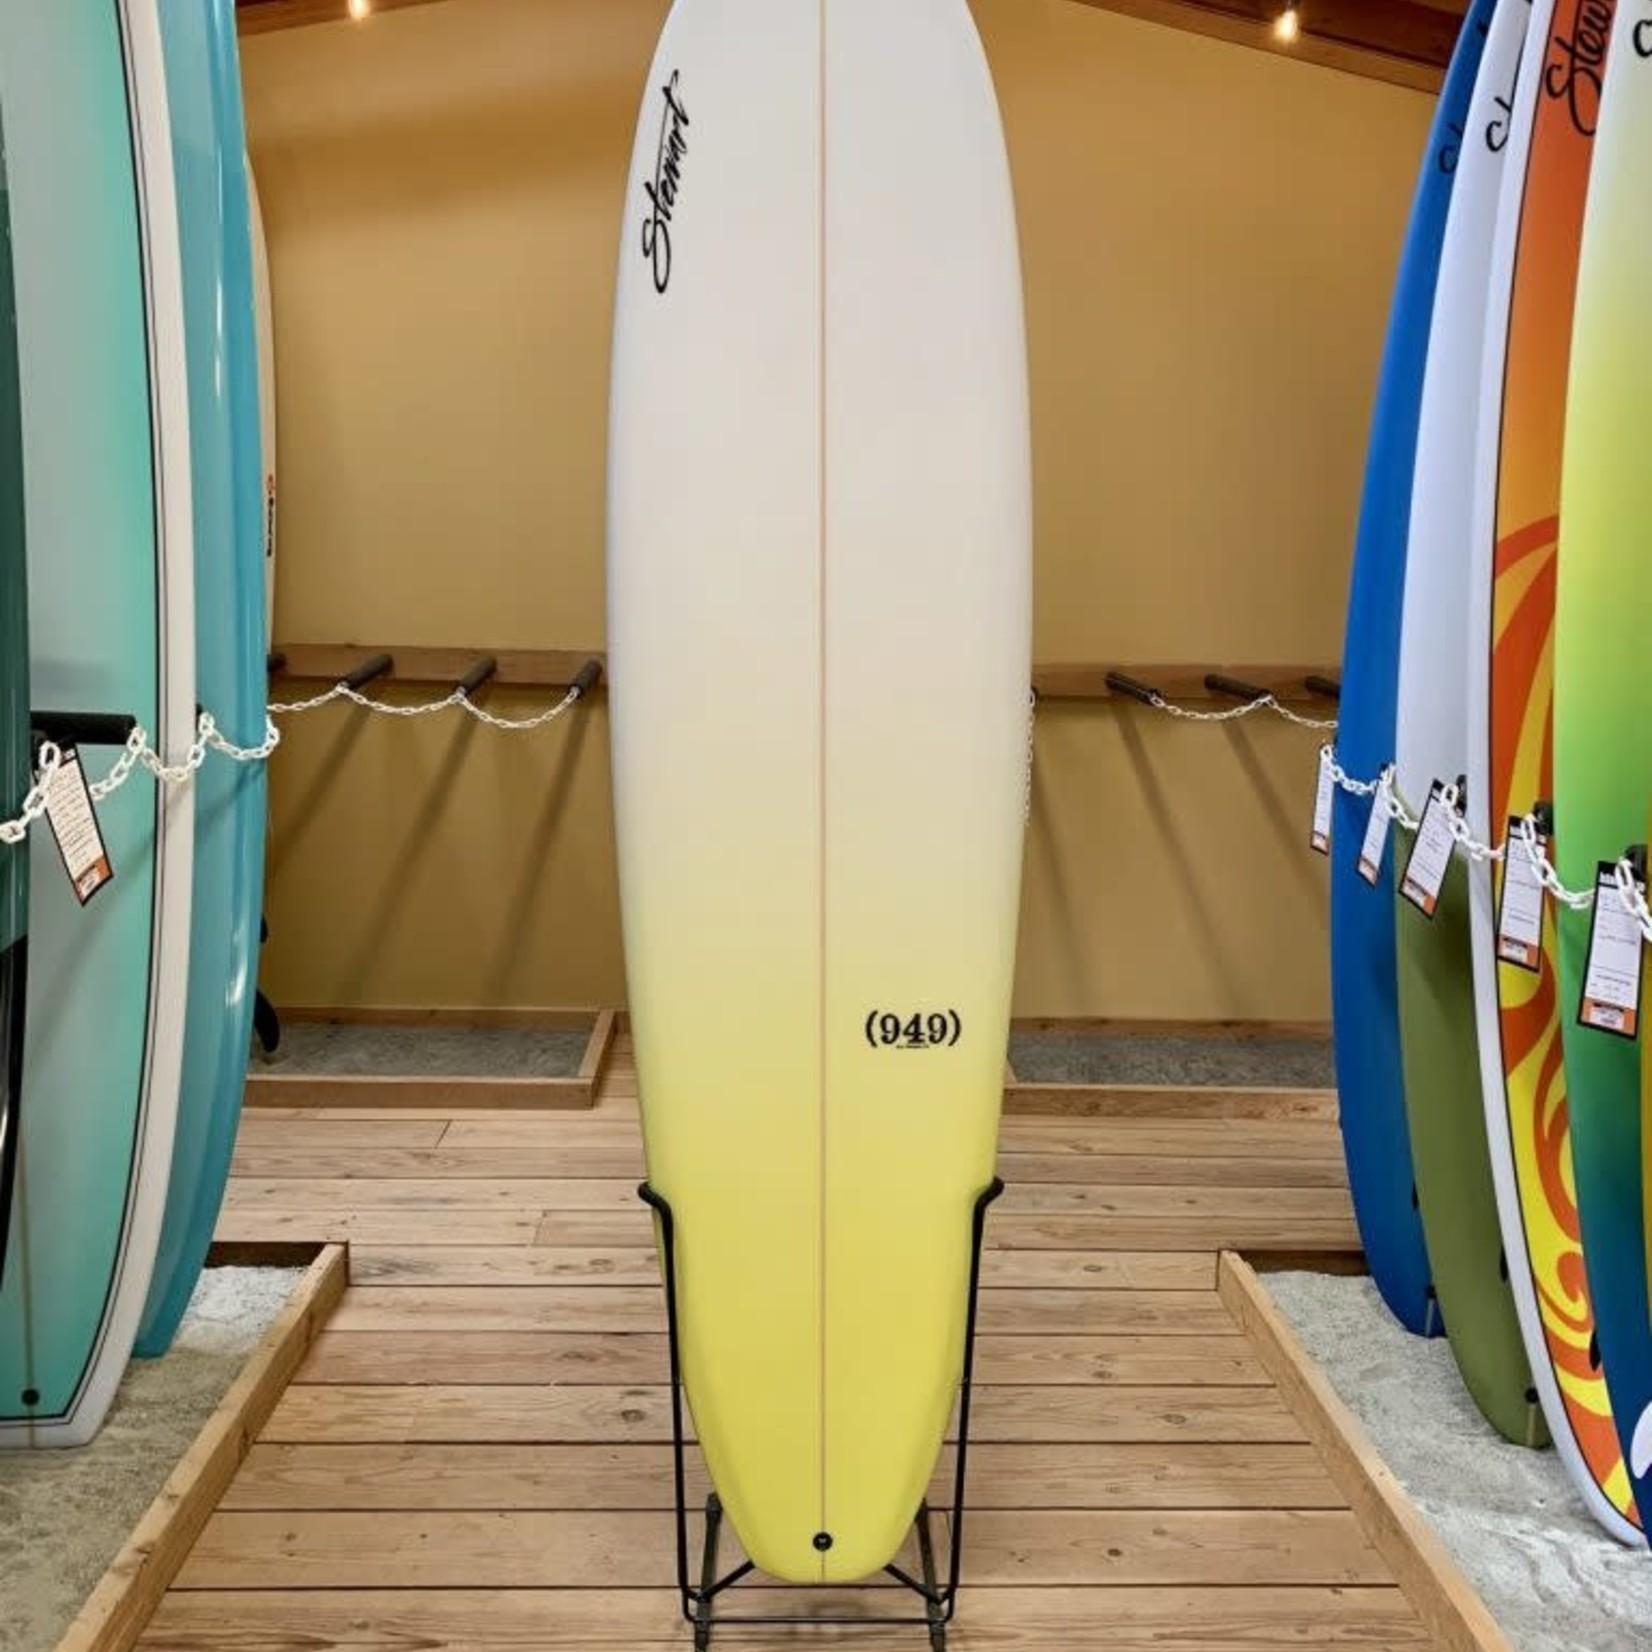 Stewart Surfboards 7'2 Stewart (949) yellow fade.